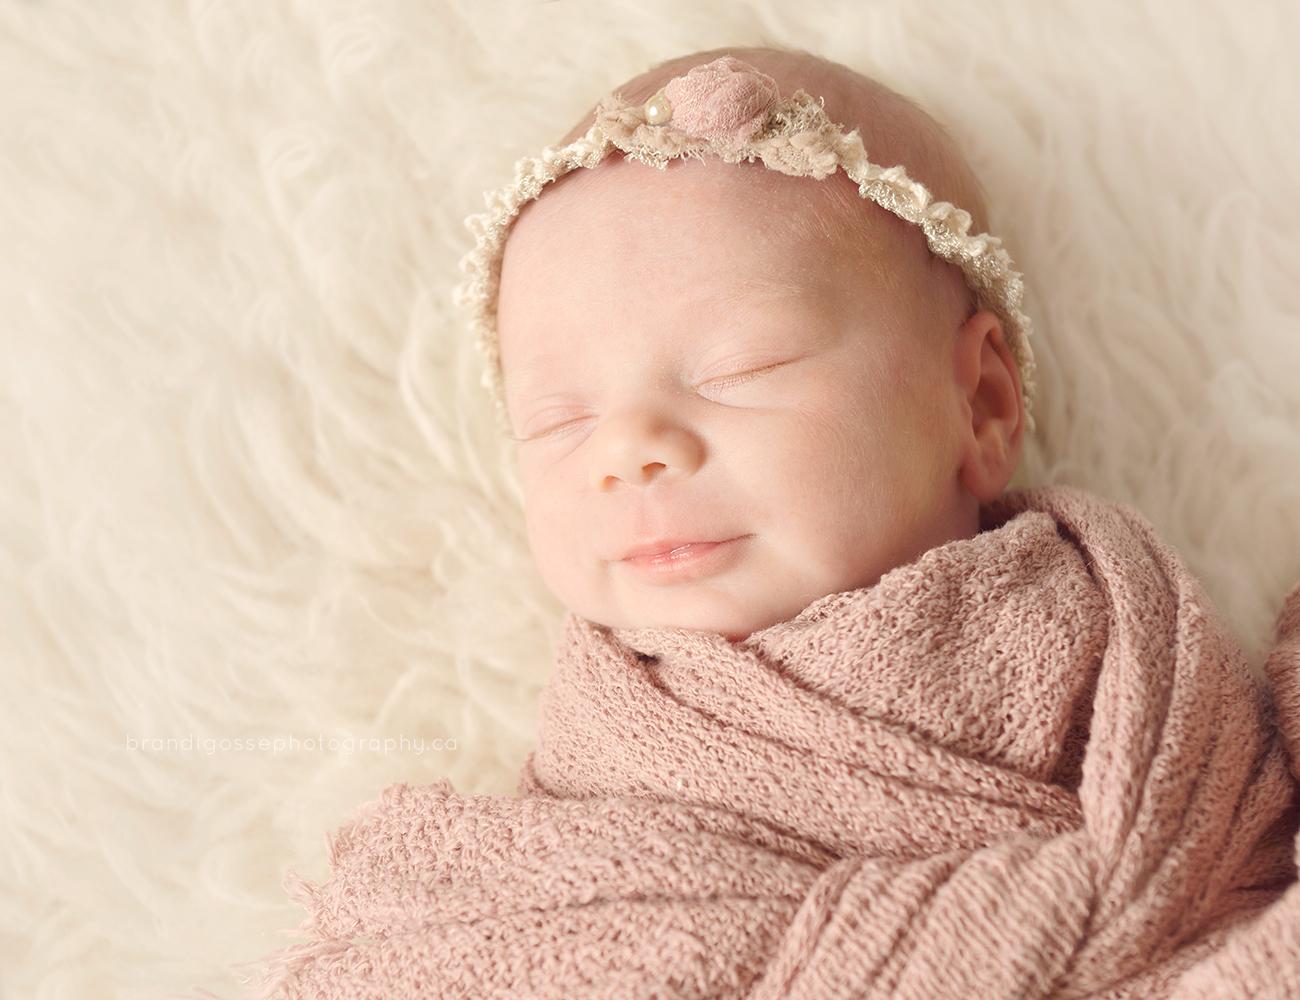 newfoundland newborn photographer, baby photographer St. John's